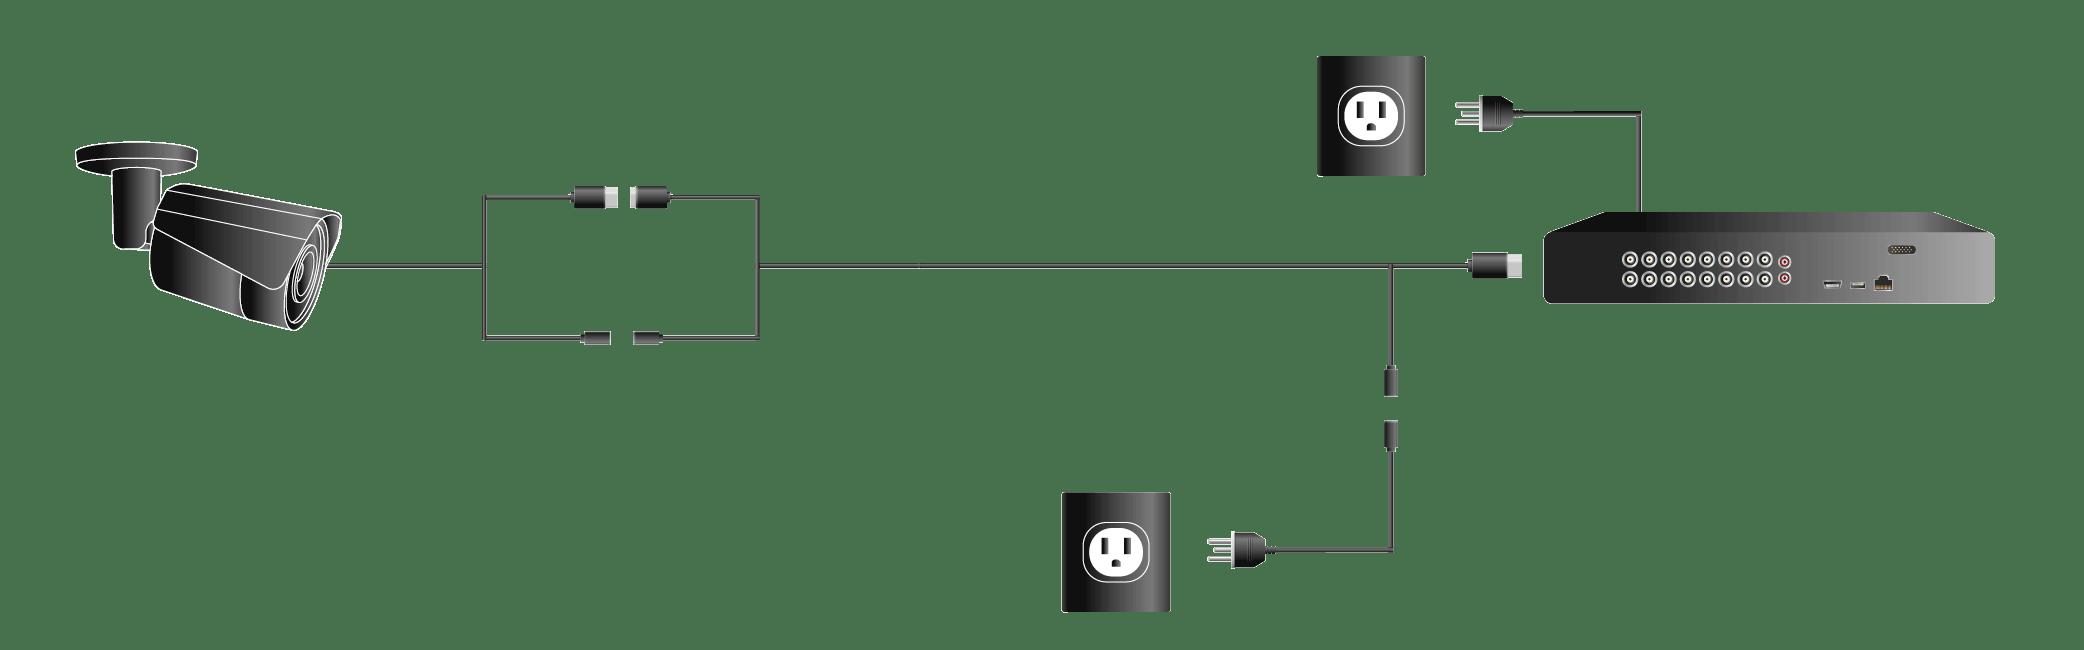 analog-cctv-install-diagram